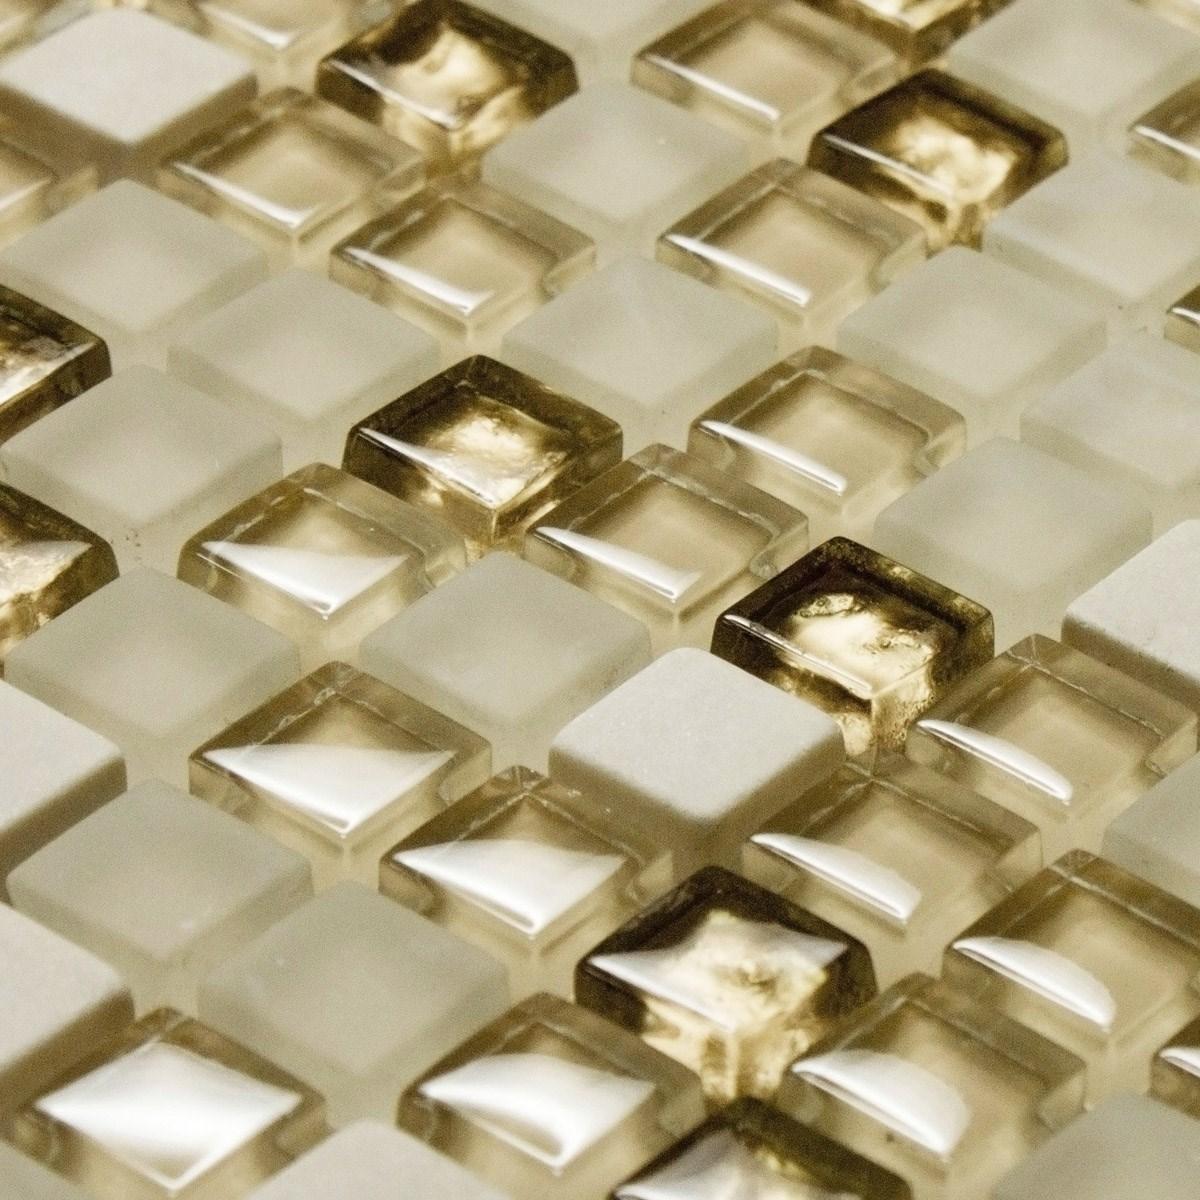 Online mosaico beige da Grossisti mosaico beige Cinesi Aliexpress.com #3E2D11 1200x1200 Banheiro Azulejo Bege